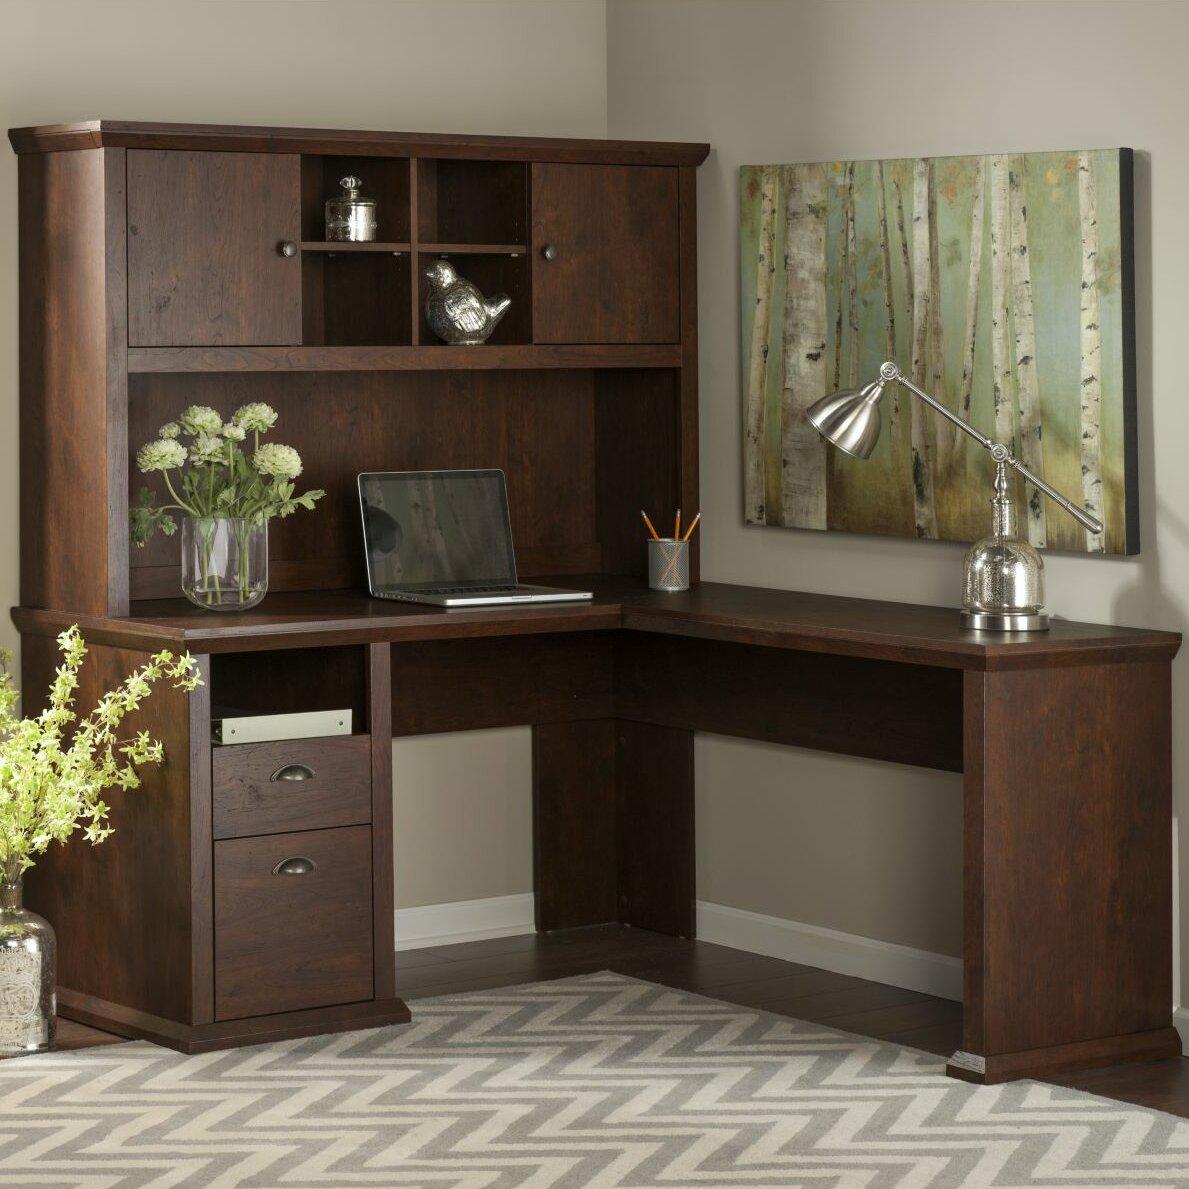 bush industries yorktown corner desk with hutch reviews wayfair. Black Bedroom Furniture Sets. Home Design Ideas